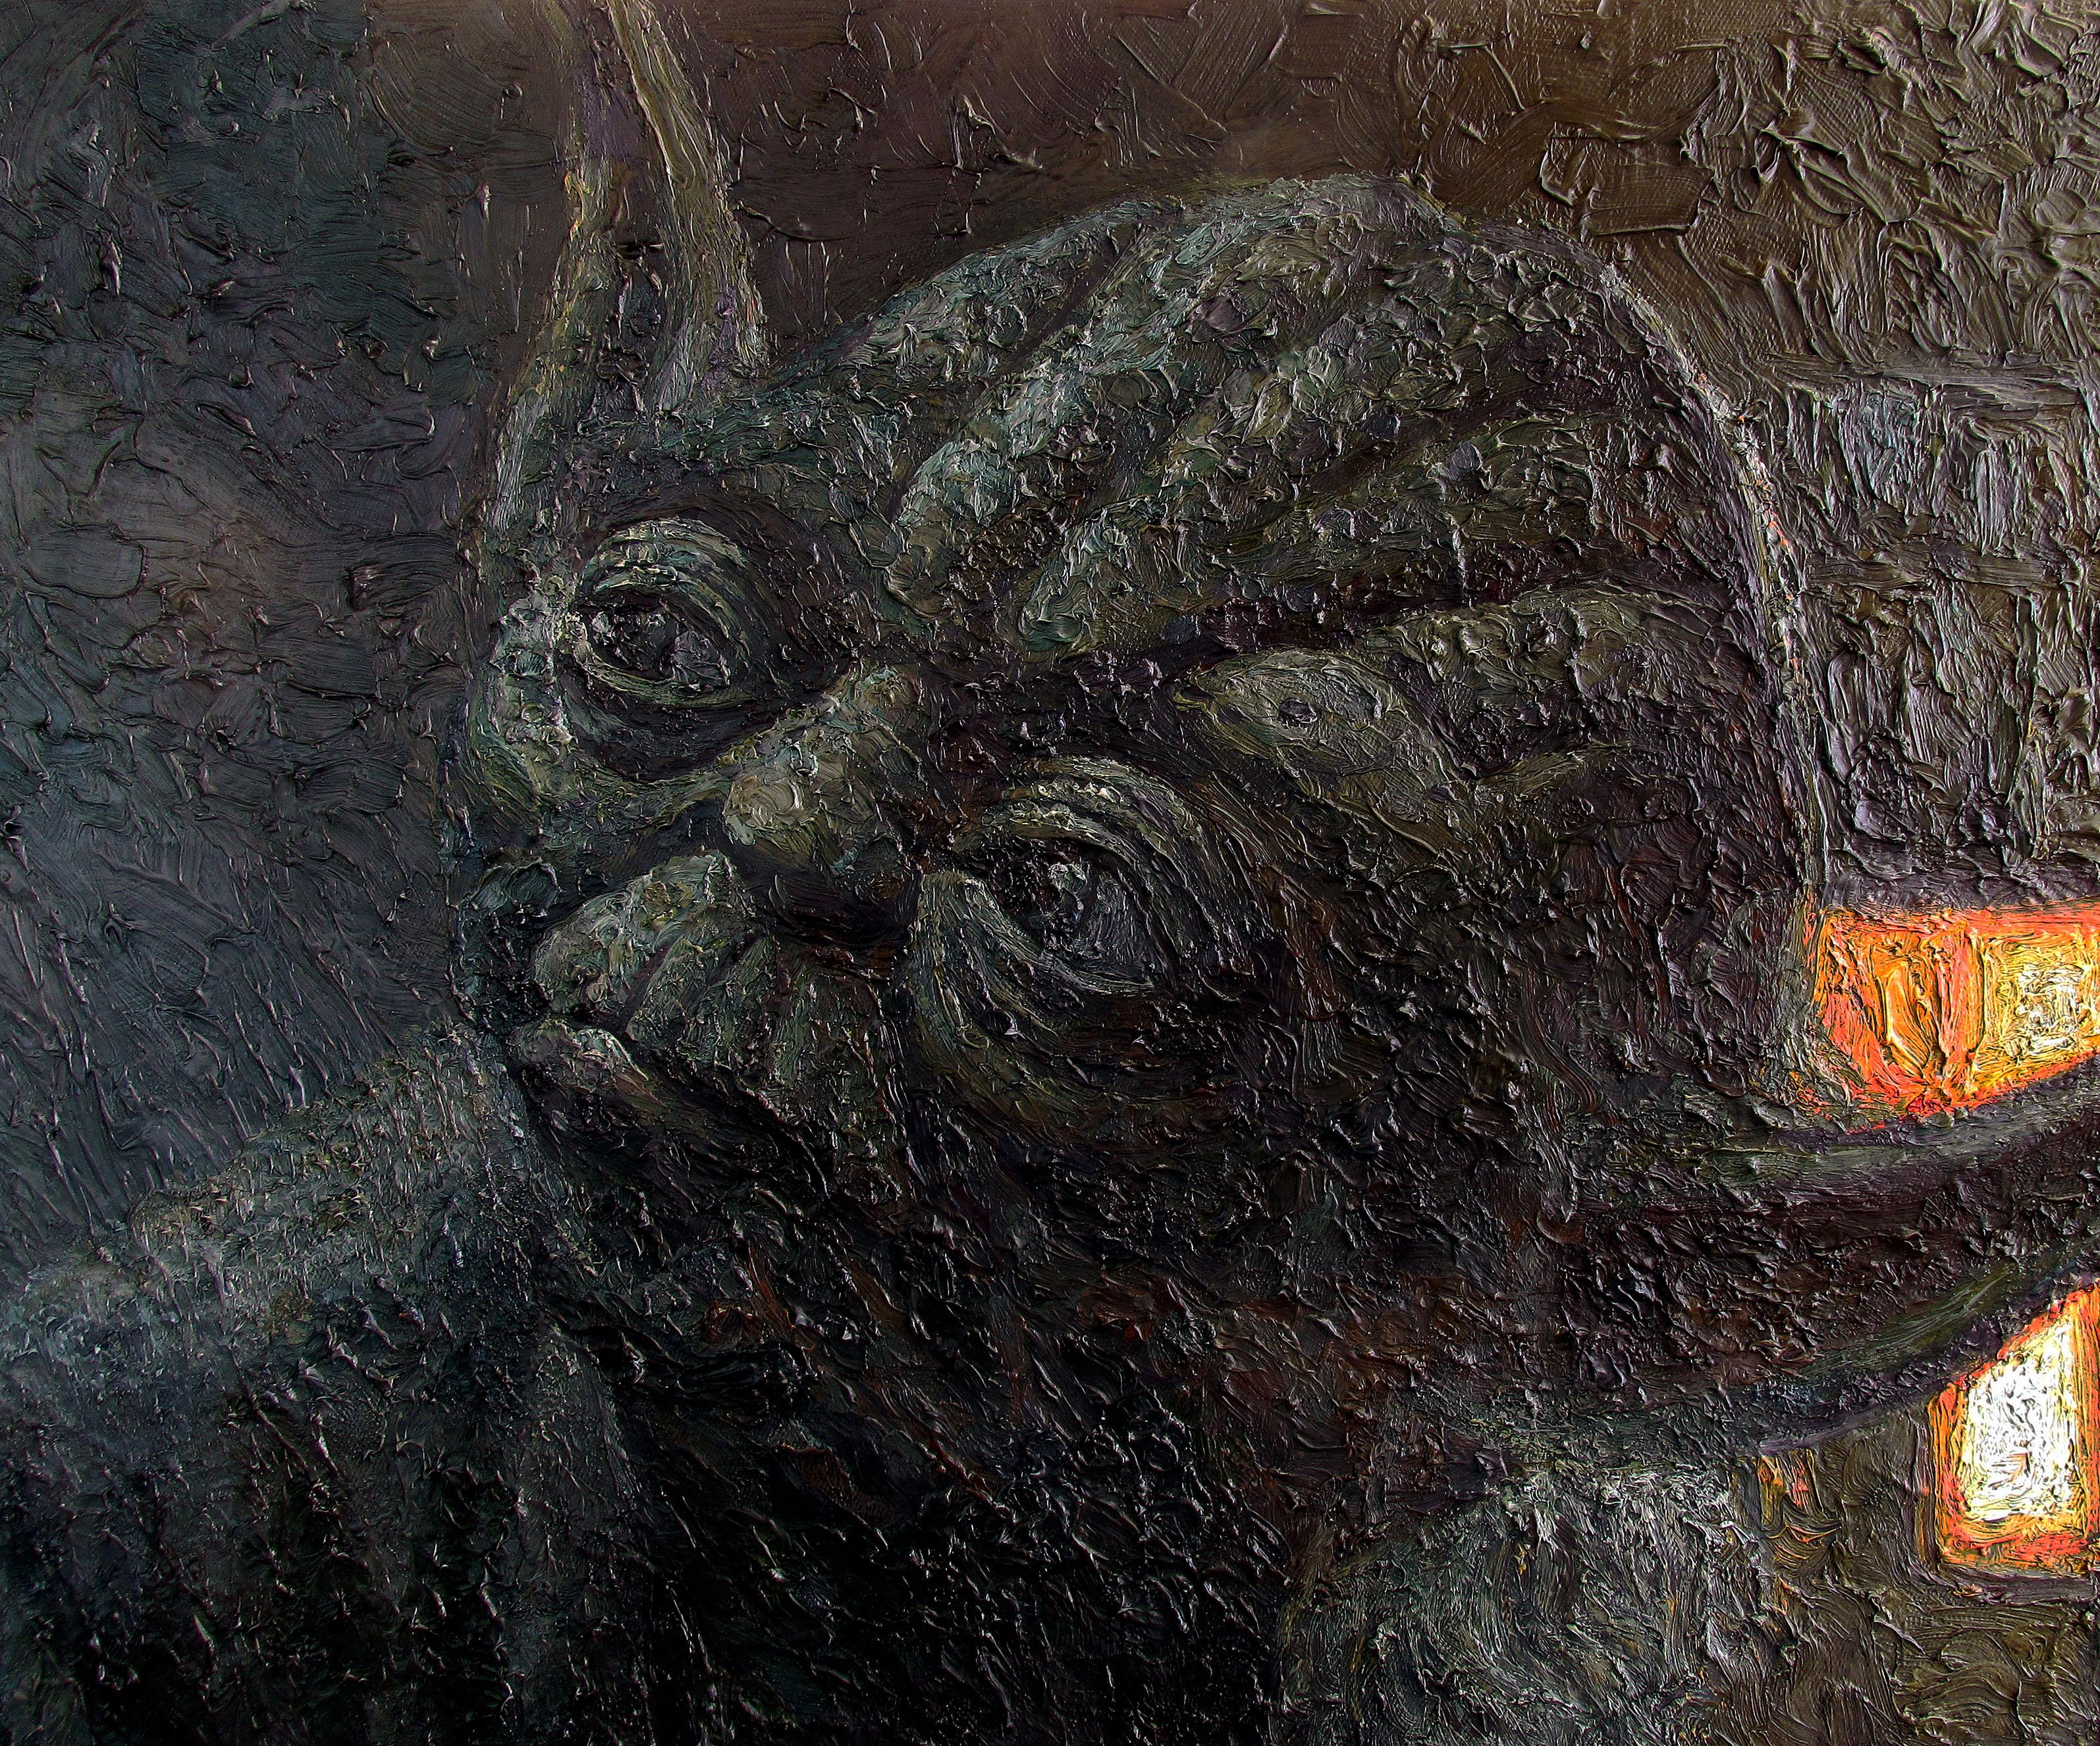 yoda empire strikes back oil painting by serkan ergun